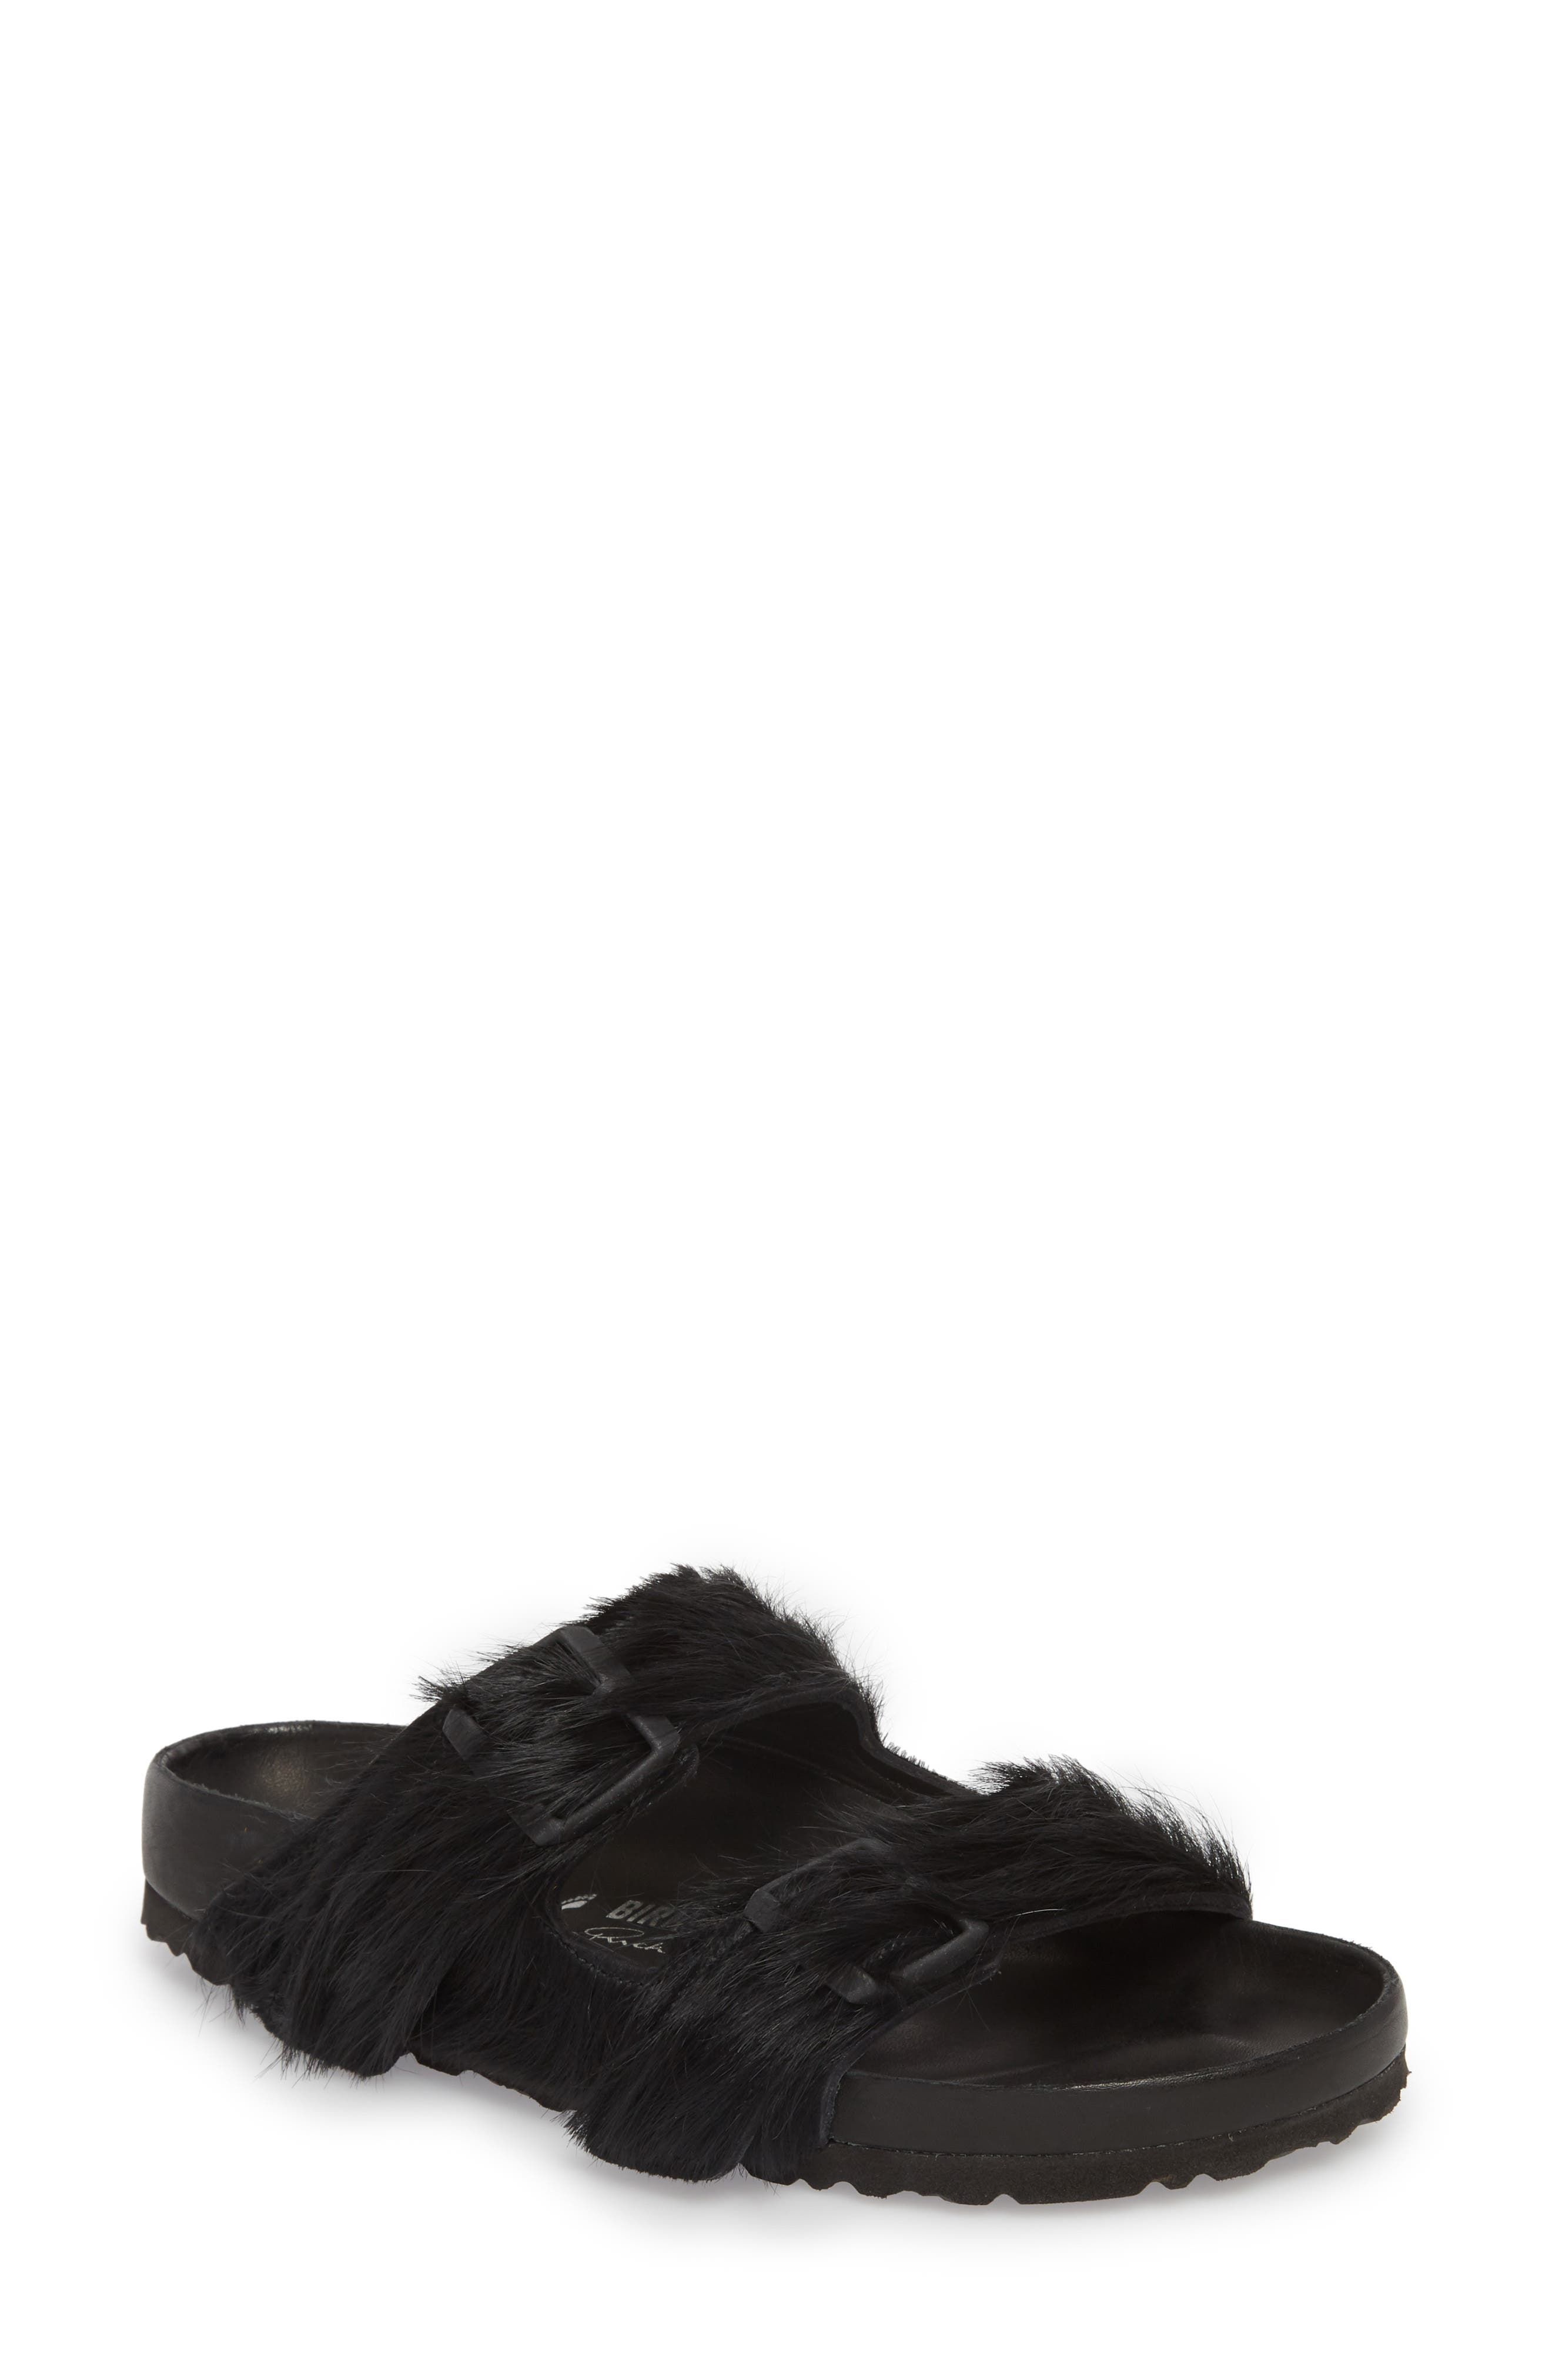 Rick Owens x Birkenstock Arizona Sandal,                             Main thumbnail 1, color,                             BLACK CALF HAIR